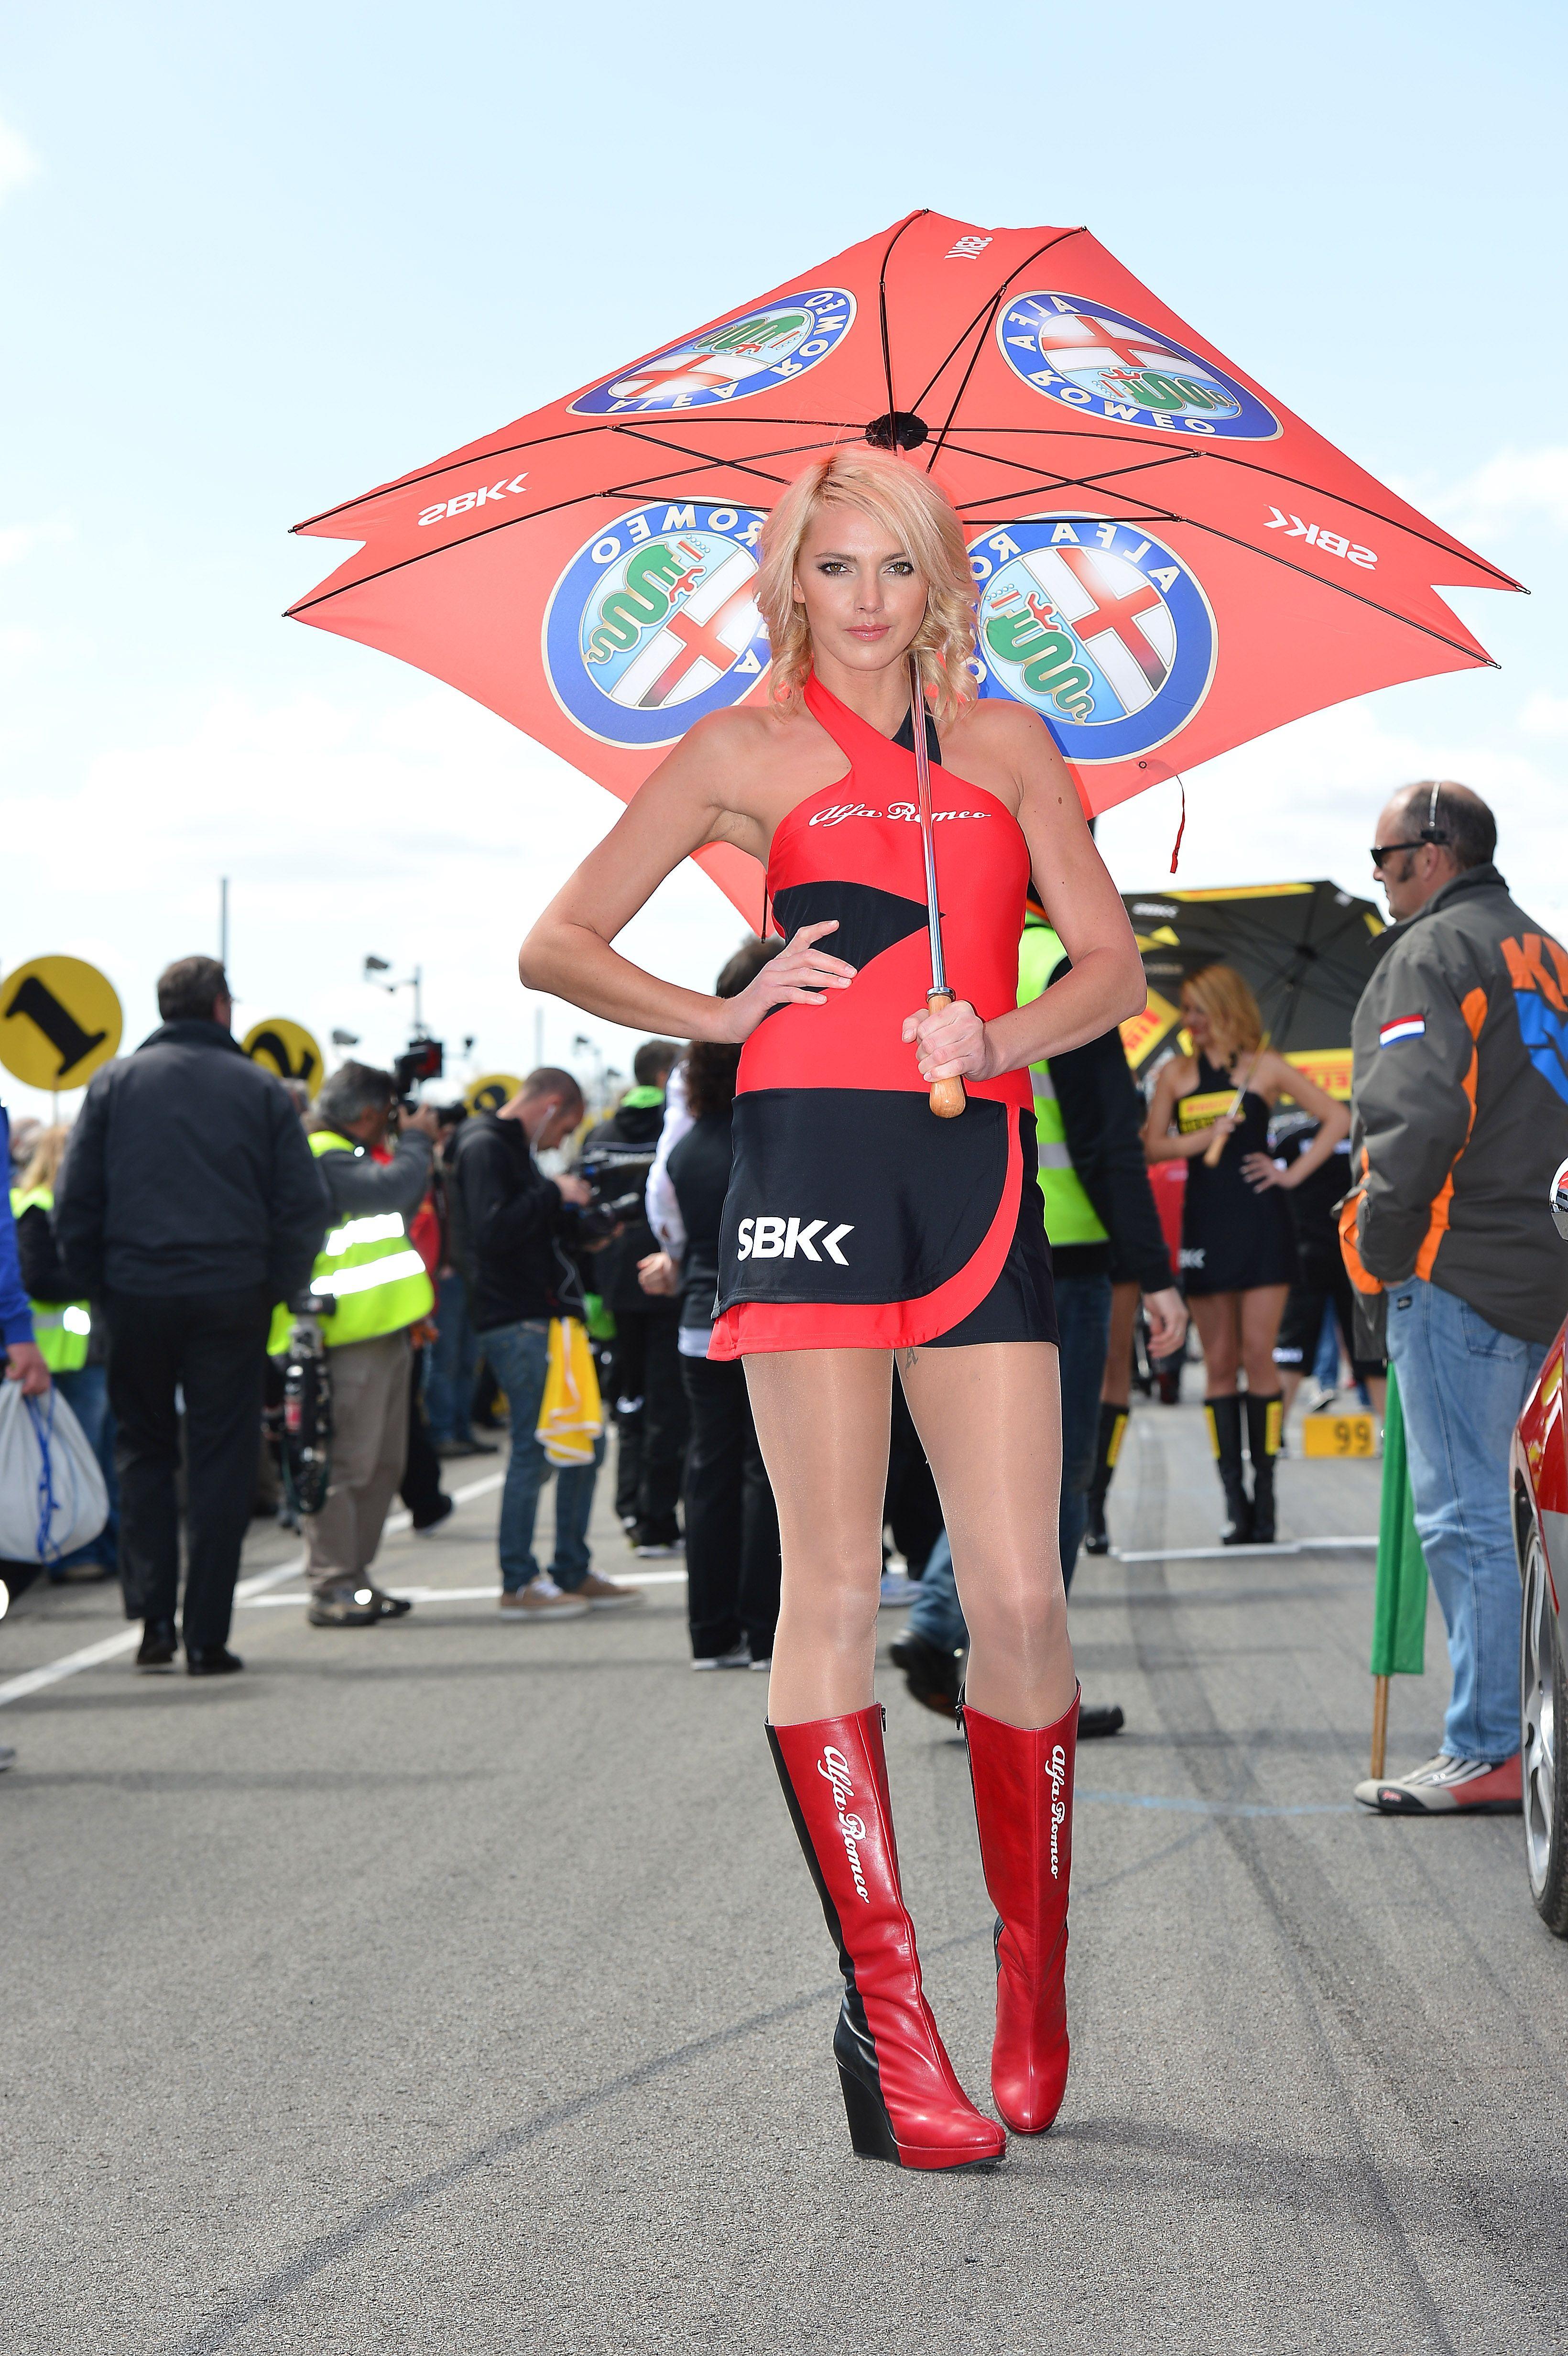 girl #gridgirl #alfaromeo grid girl superbike